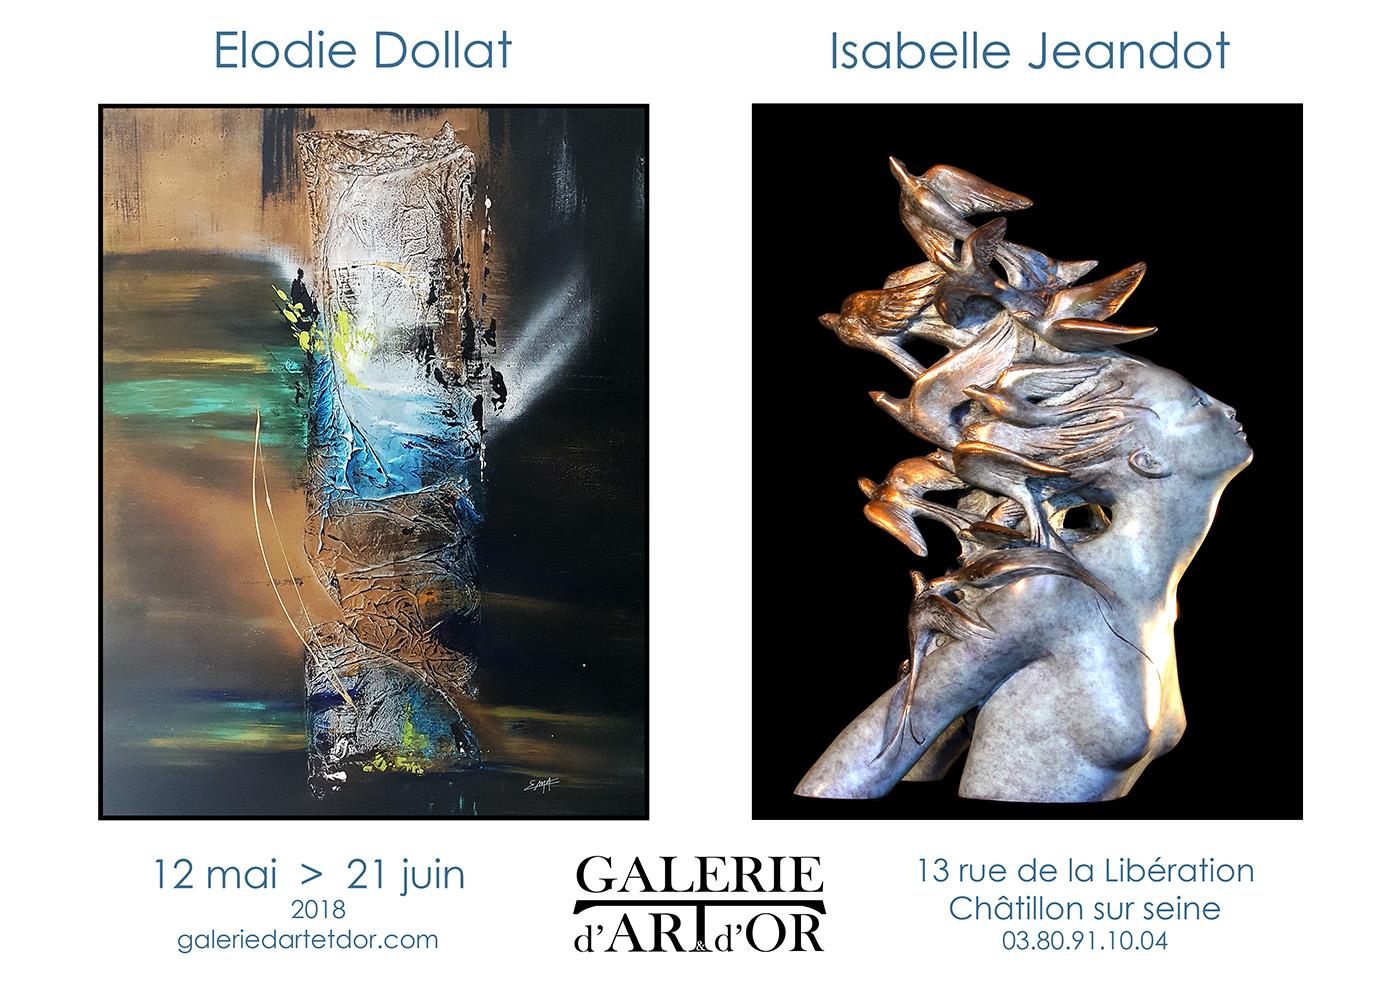 galerie d'art et d'or Isabelle Jeandot Elodie Dollat